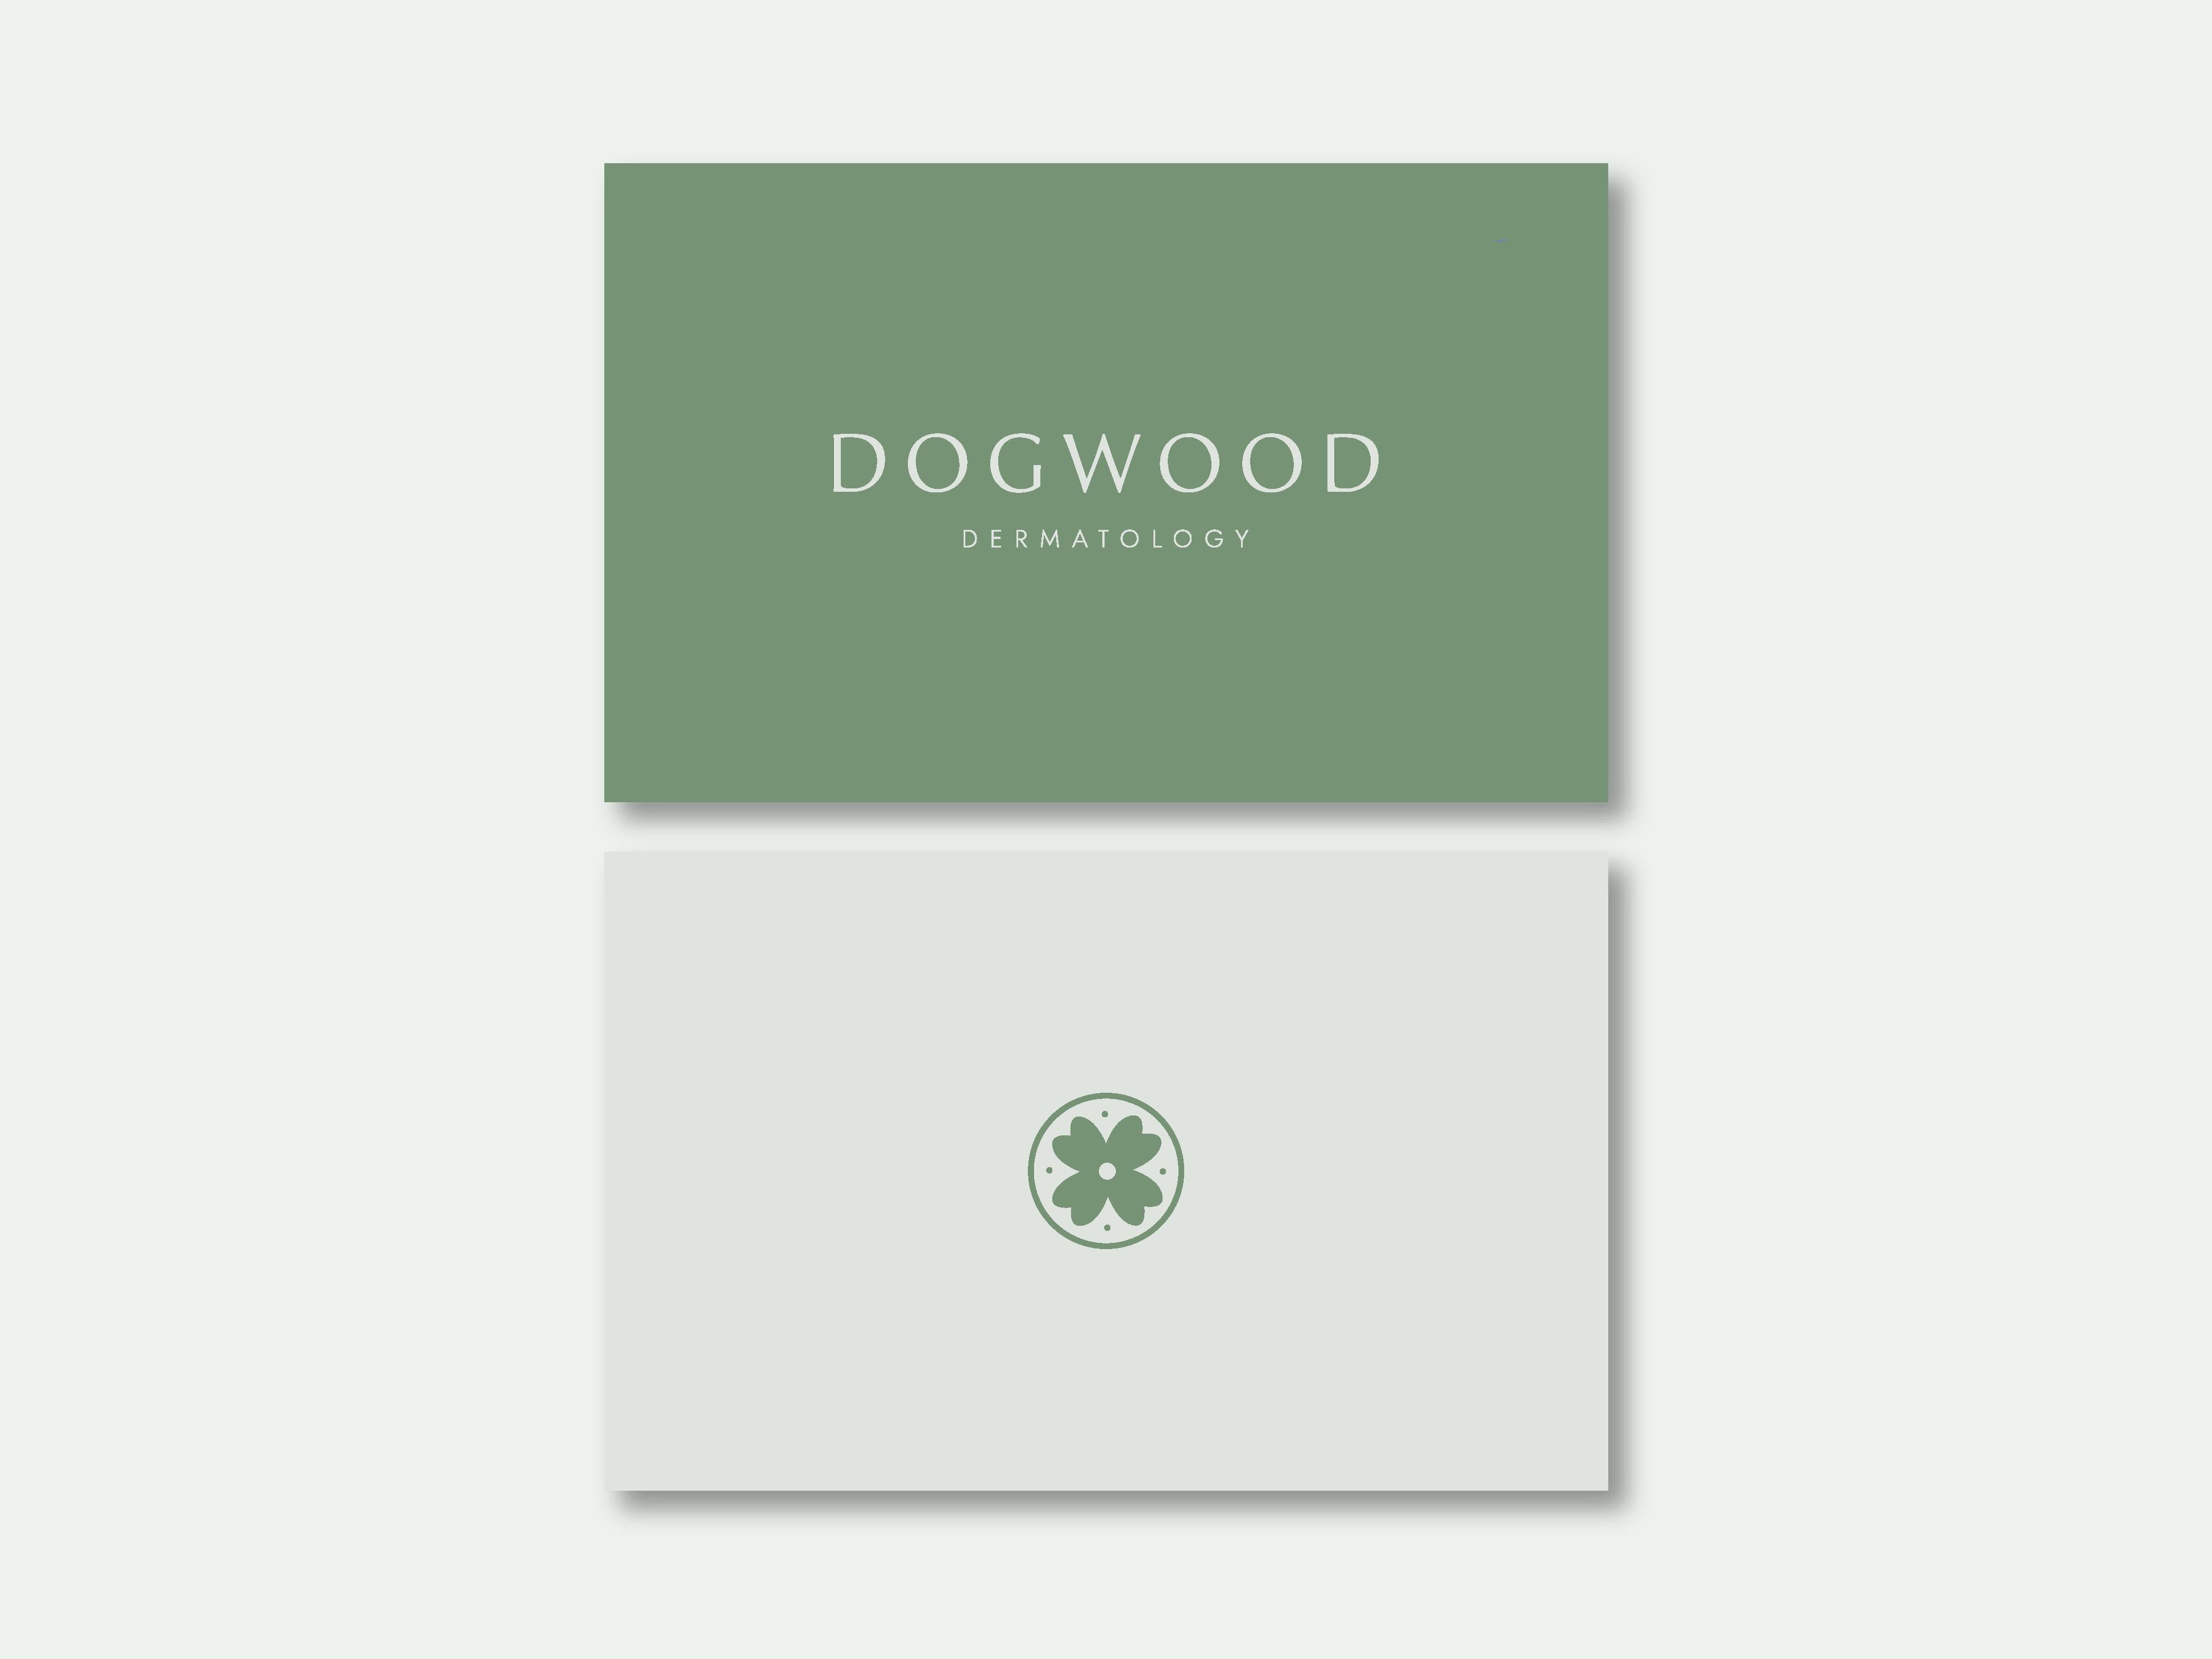 Dogwood 03